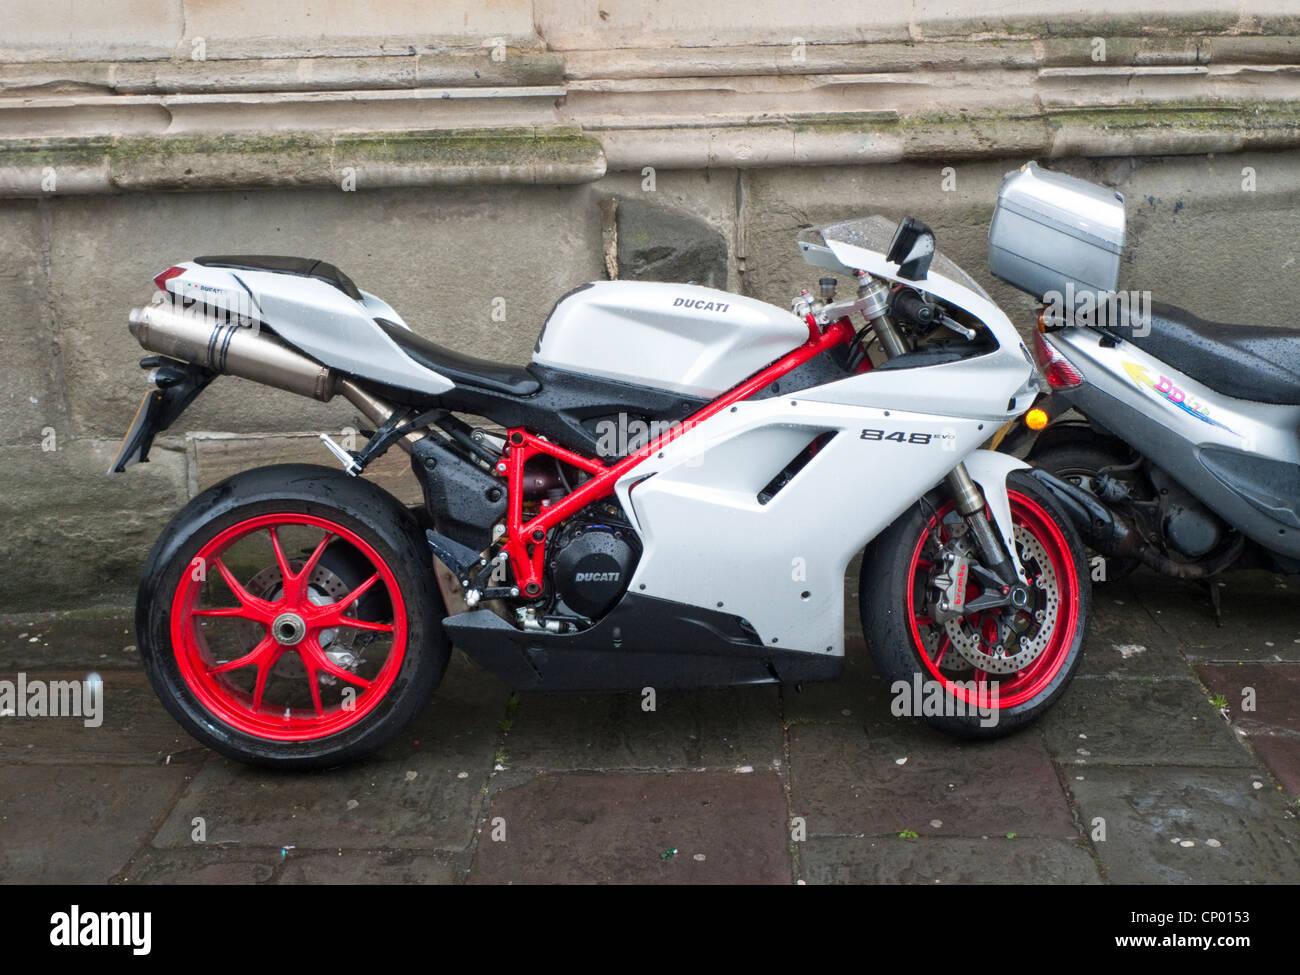 Ducati 848 Evo Motorcycle Stock Photo